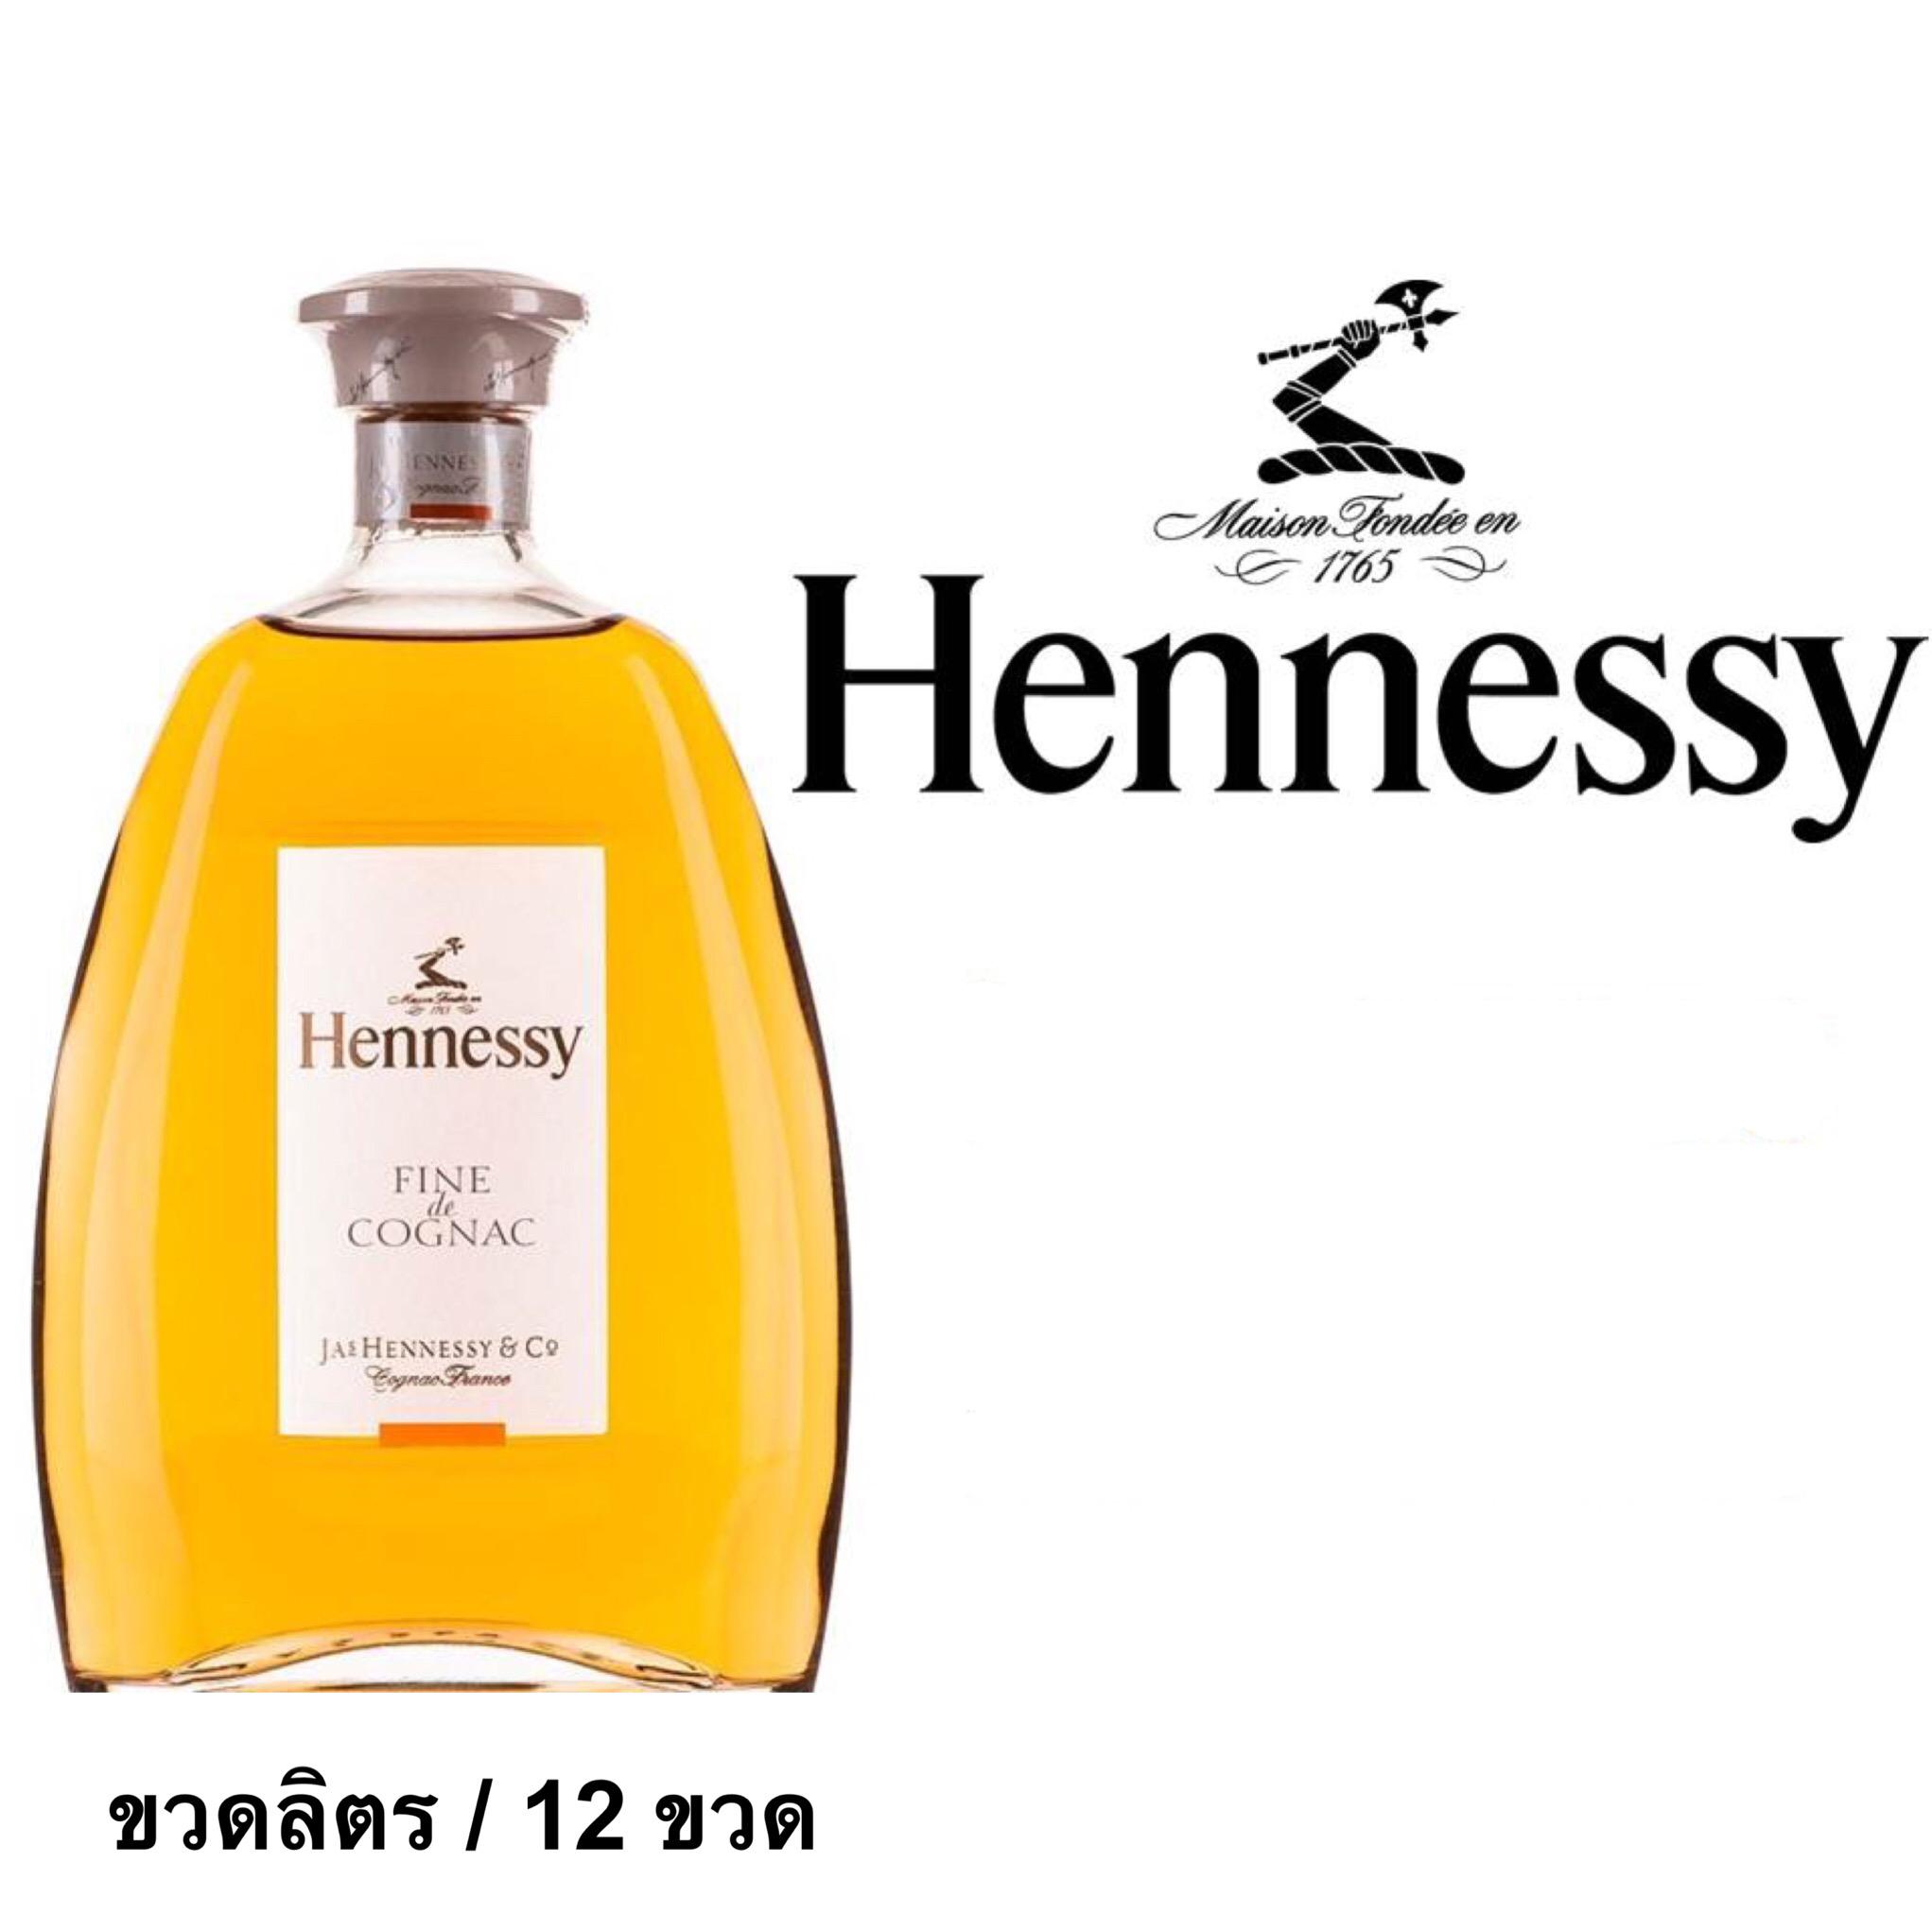 HENNESSY FINE DE COGNAC 1 L ลัง 12 ขวด